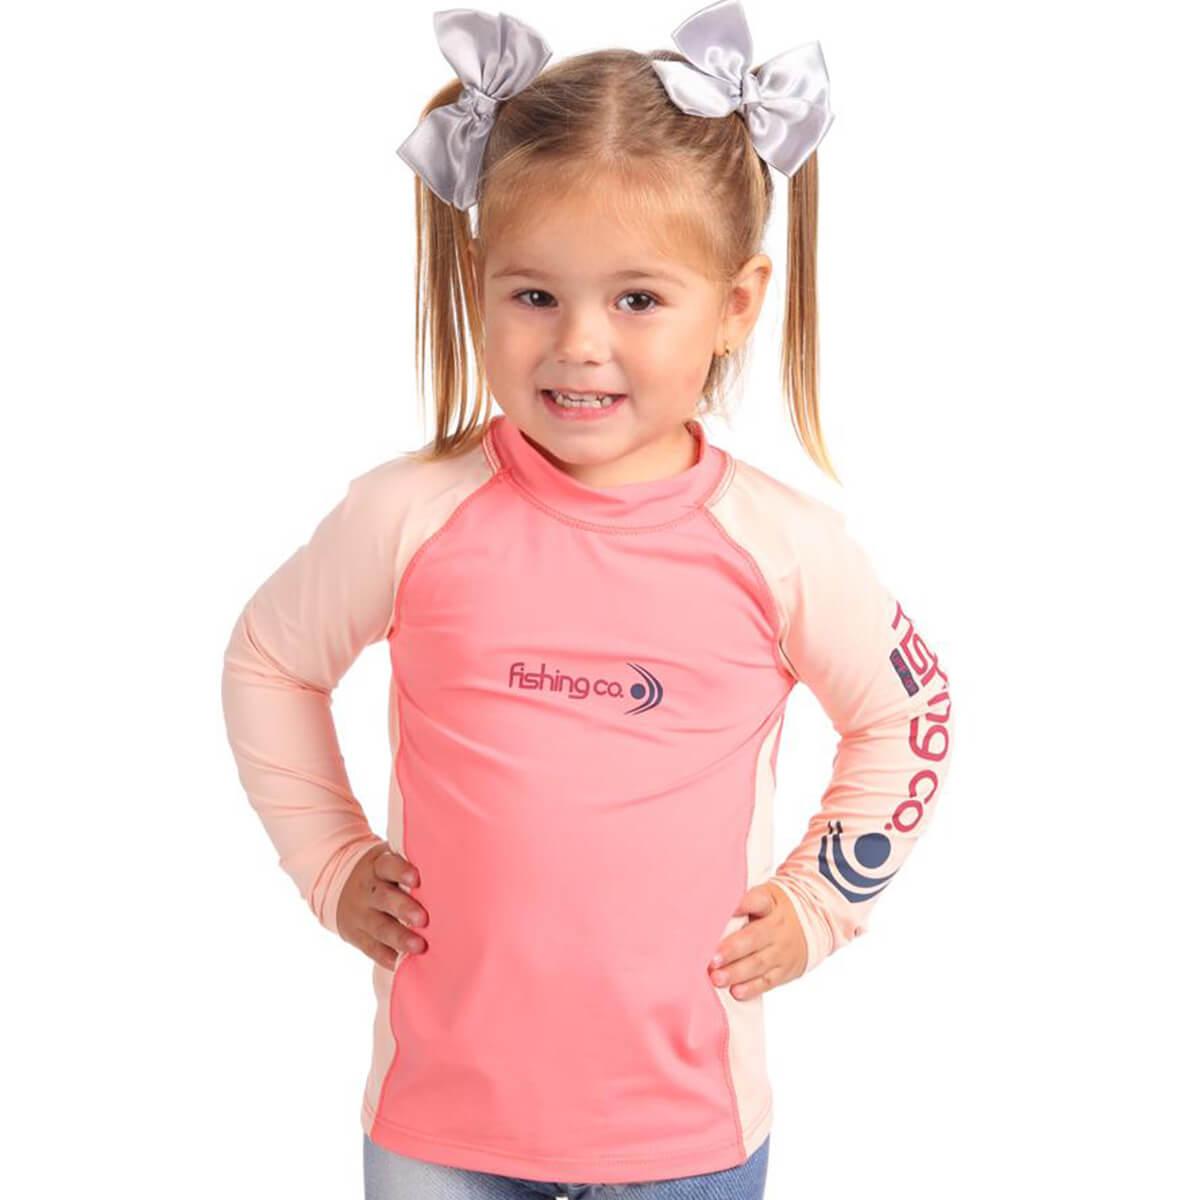 Camiseta Fishing Co Infantil 4 anos